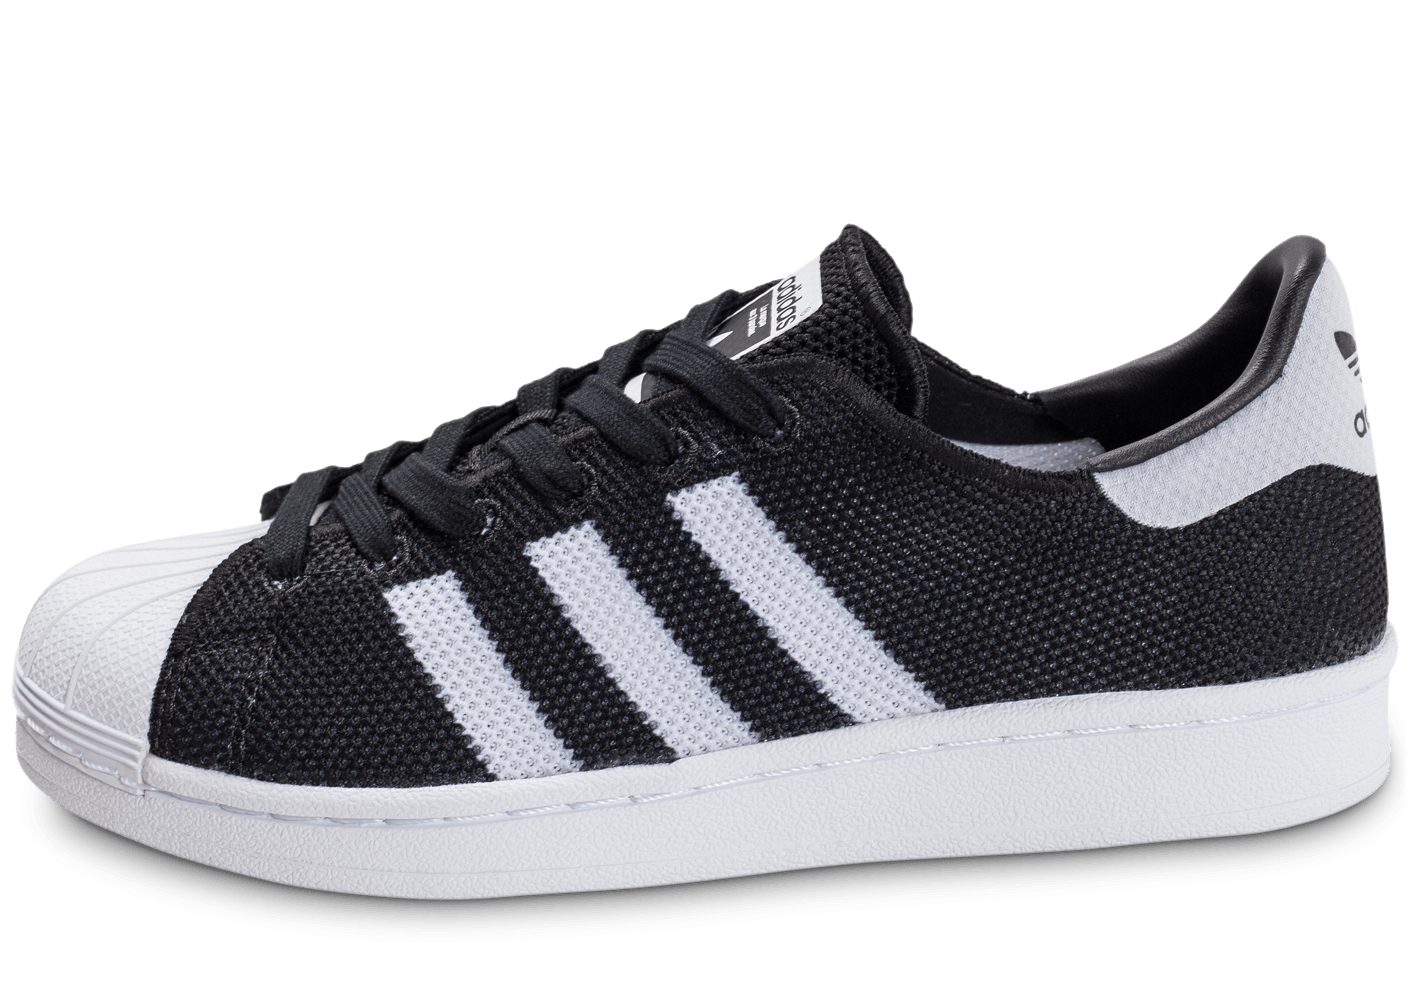 Black 2 Superstar Shoes Adidas J Originals a54w 29YWHIEeDb